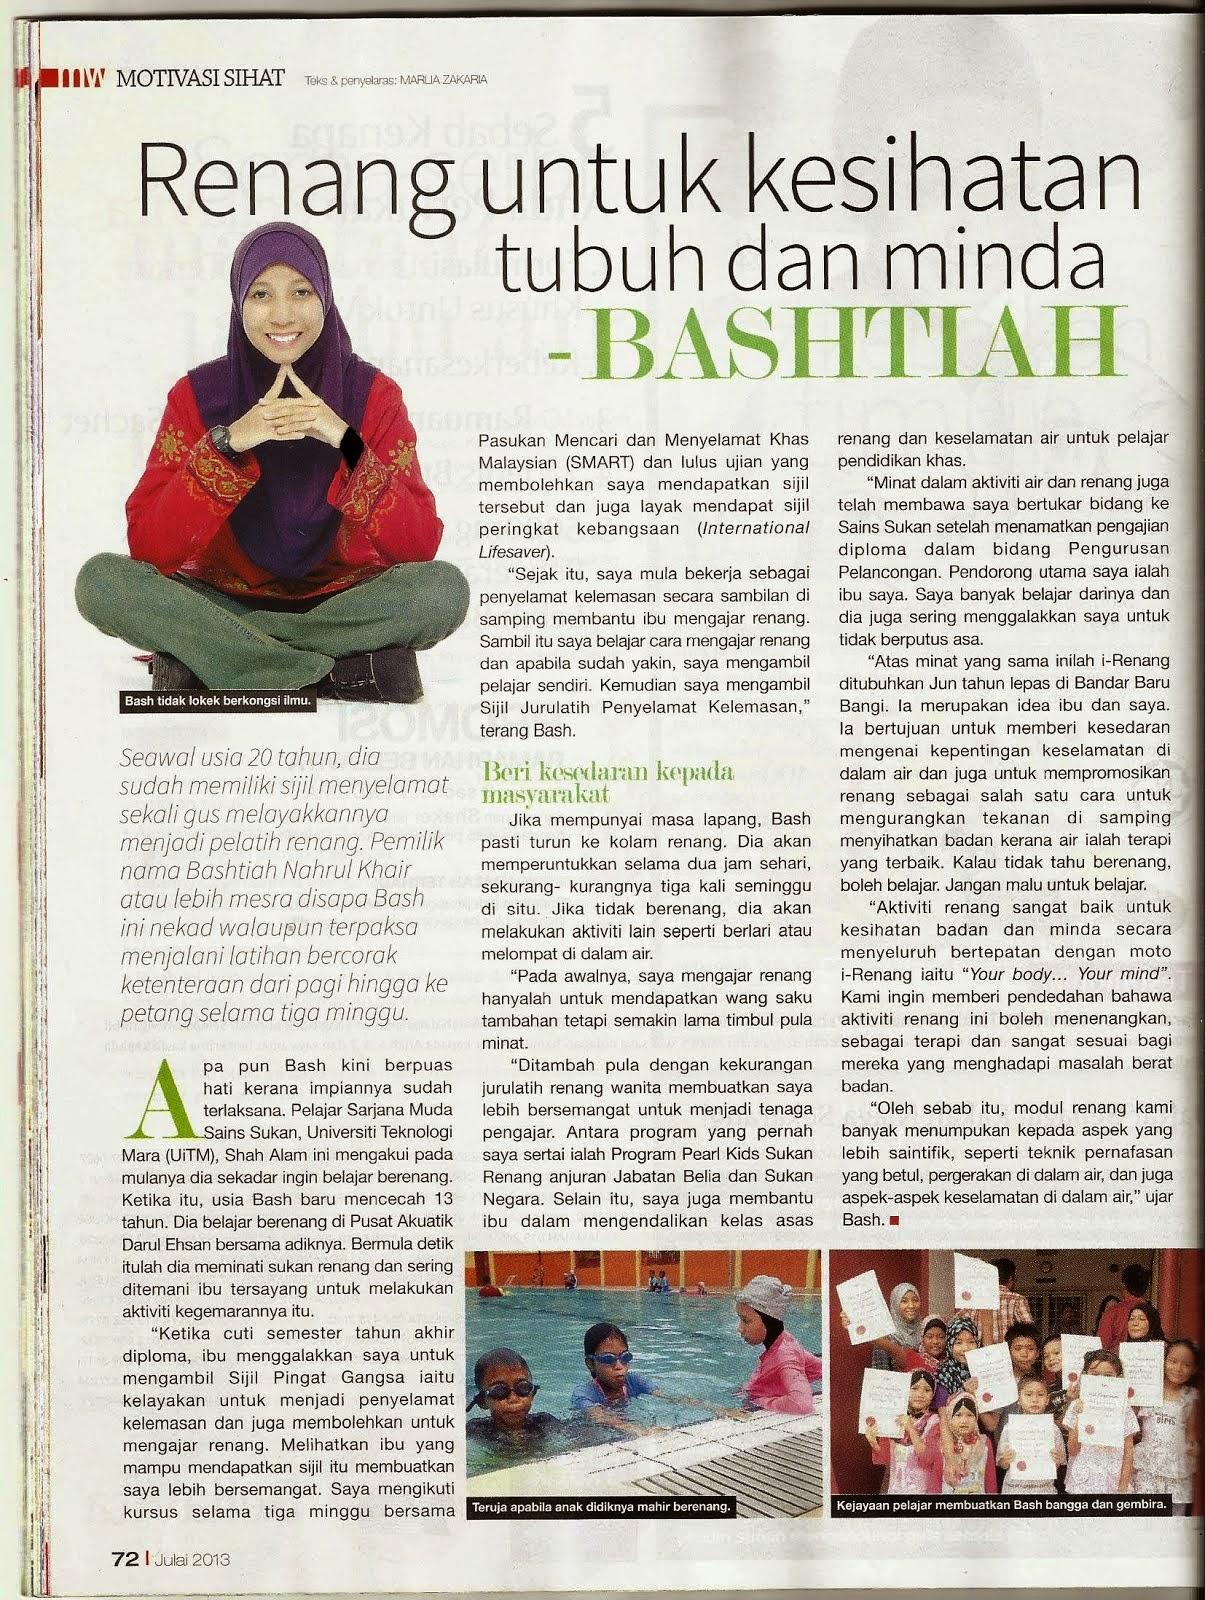 Majalah Mingguan Wanita- Motivasi Sihat